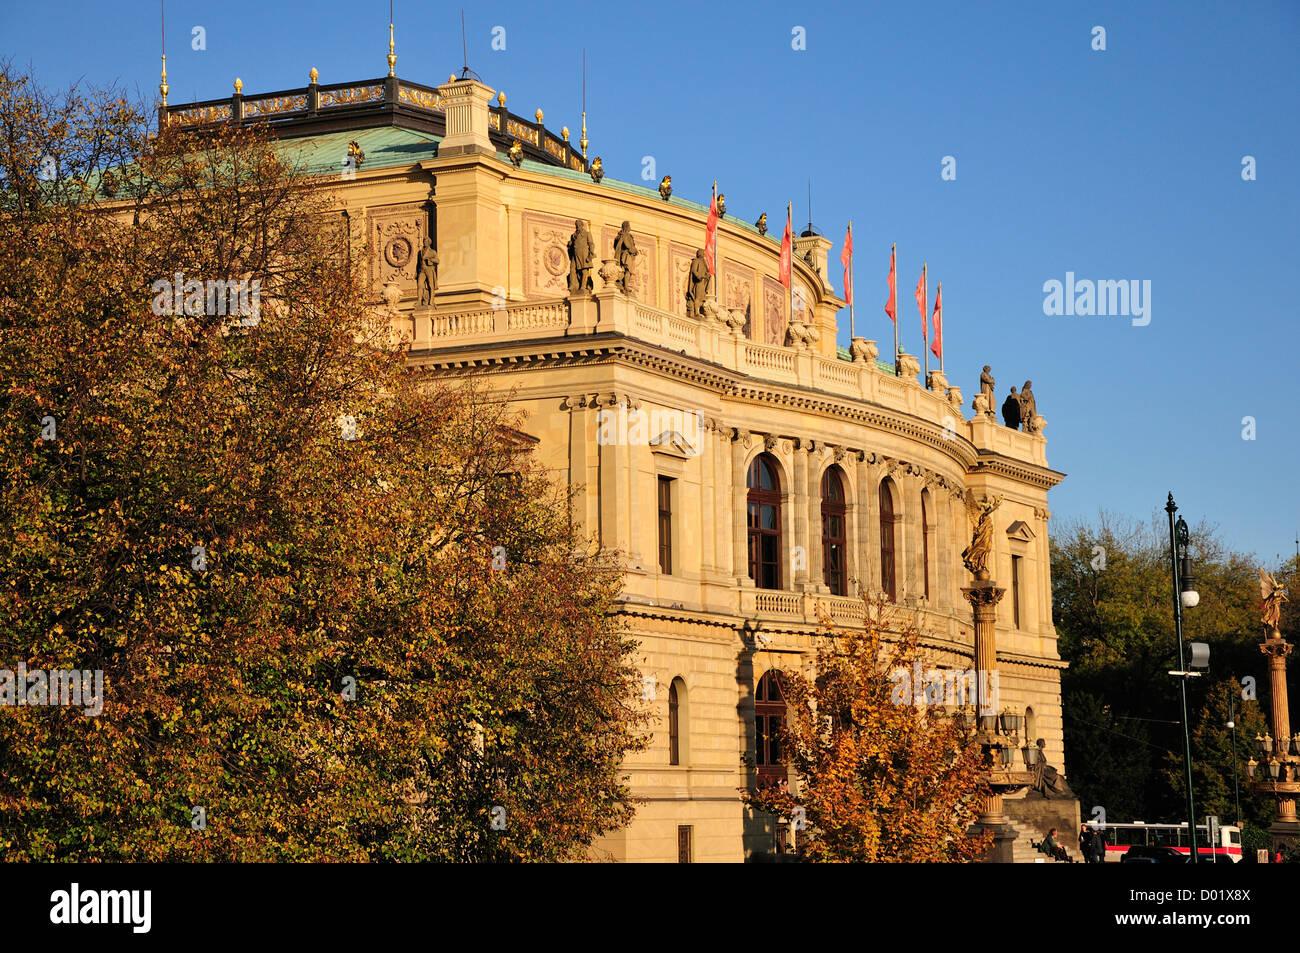 Prag, Tschechische Republik. Rudolfinum (Josef Zitek; 1875-84. Neo-Renaissance) Concert Hall Stockfoto